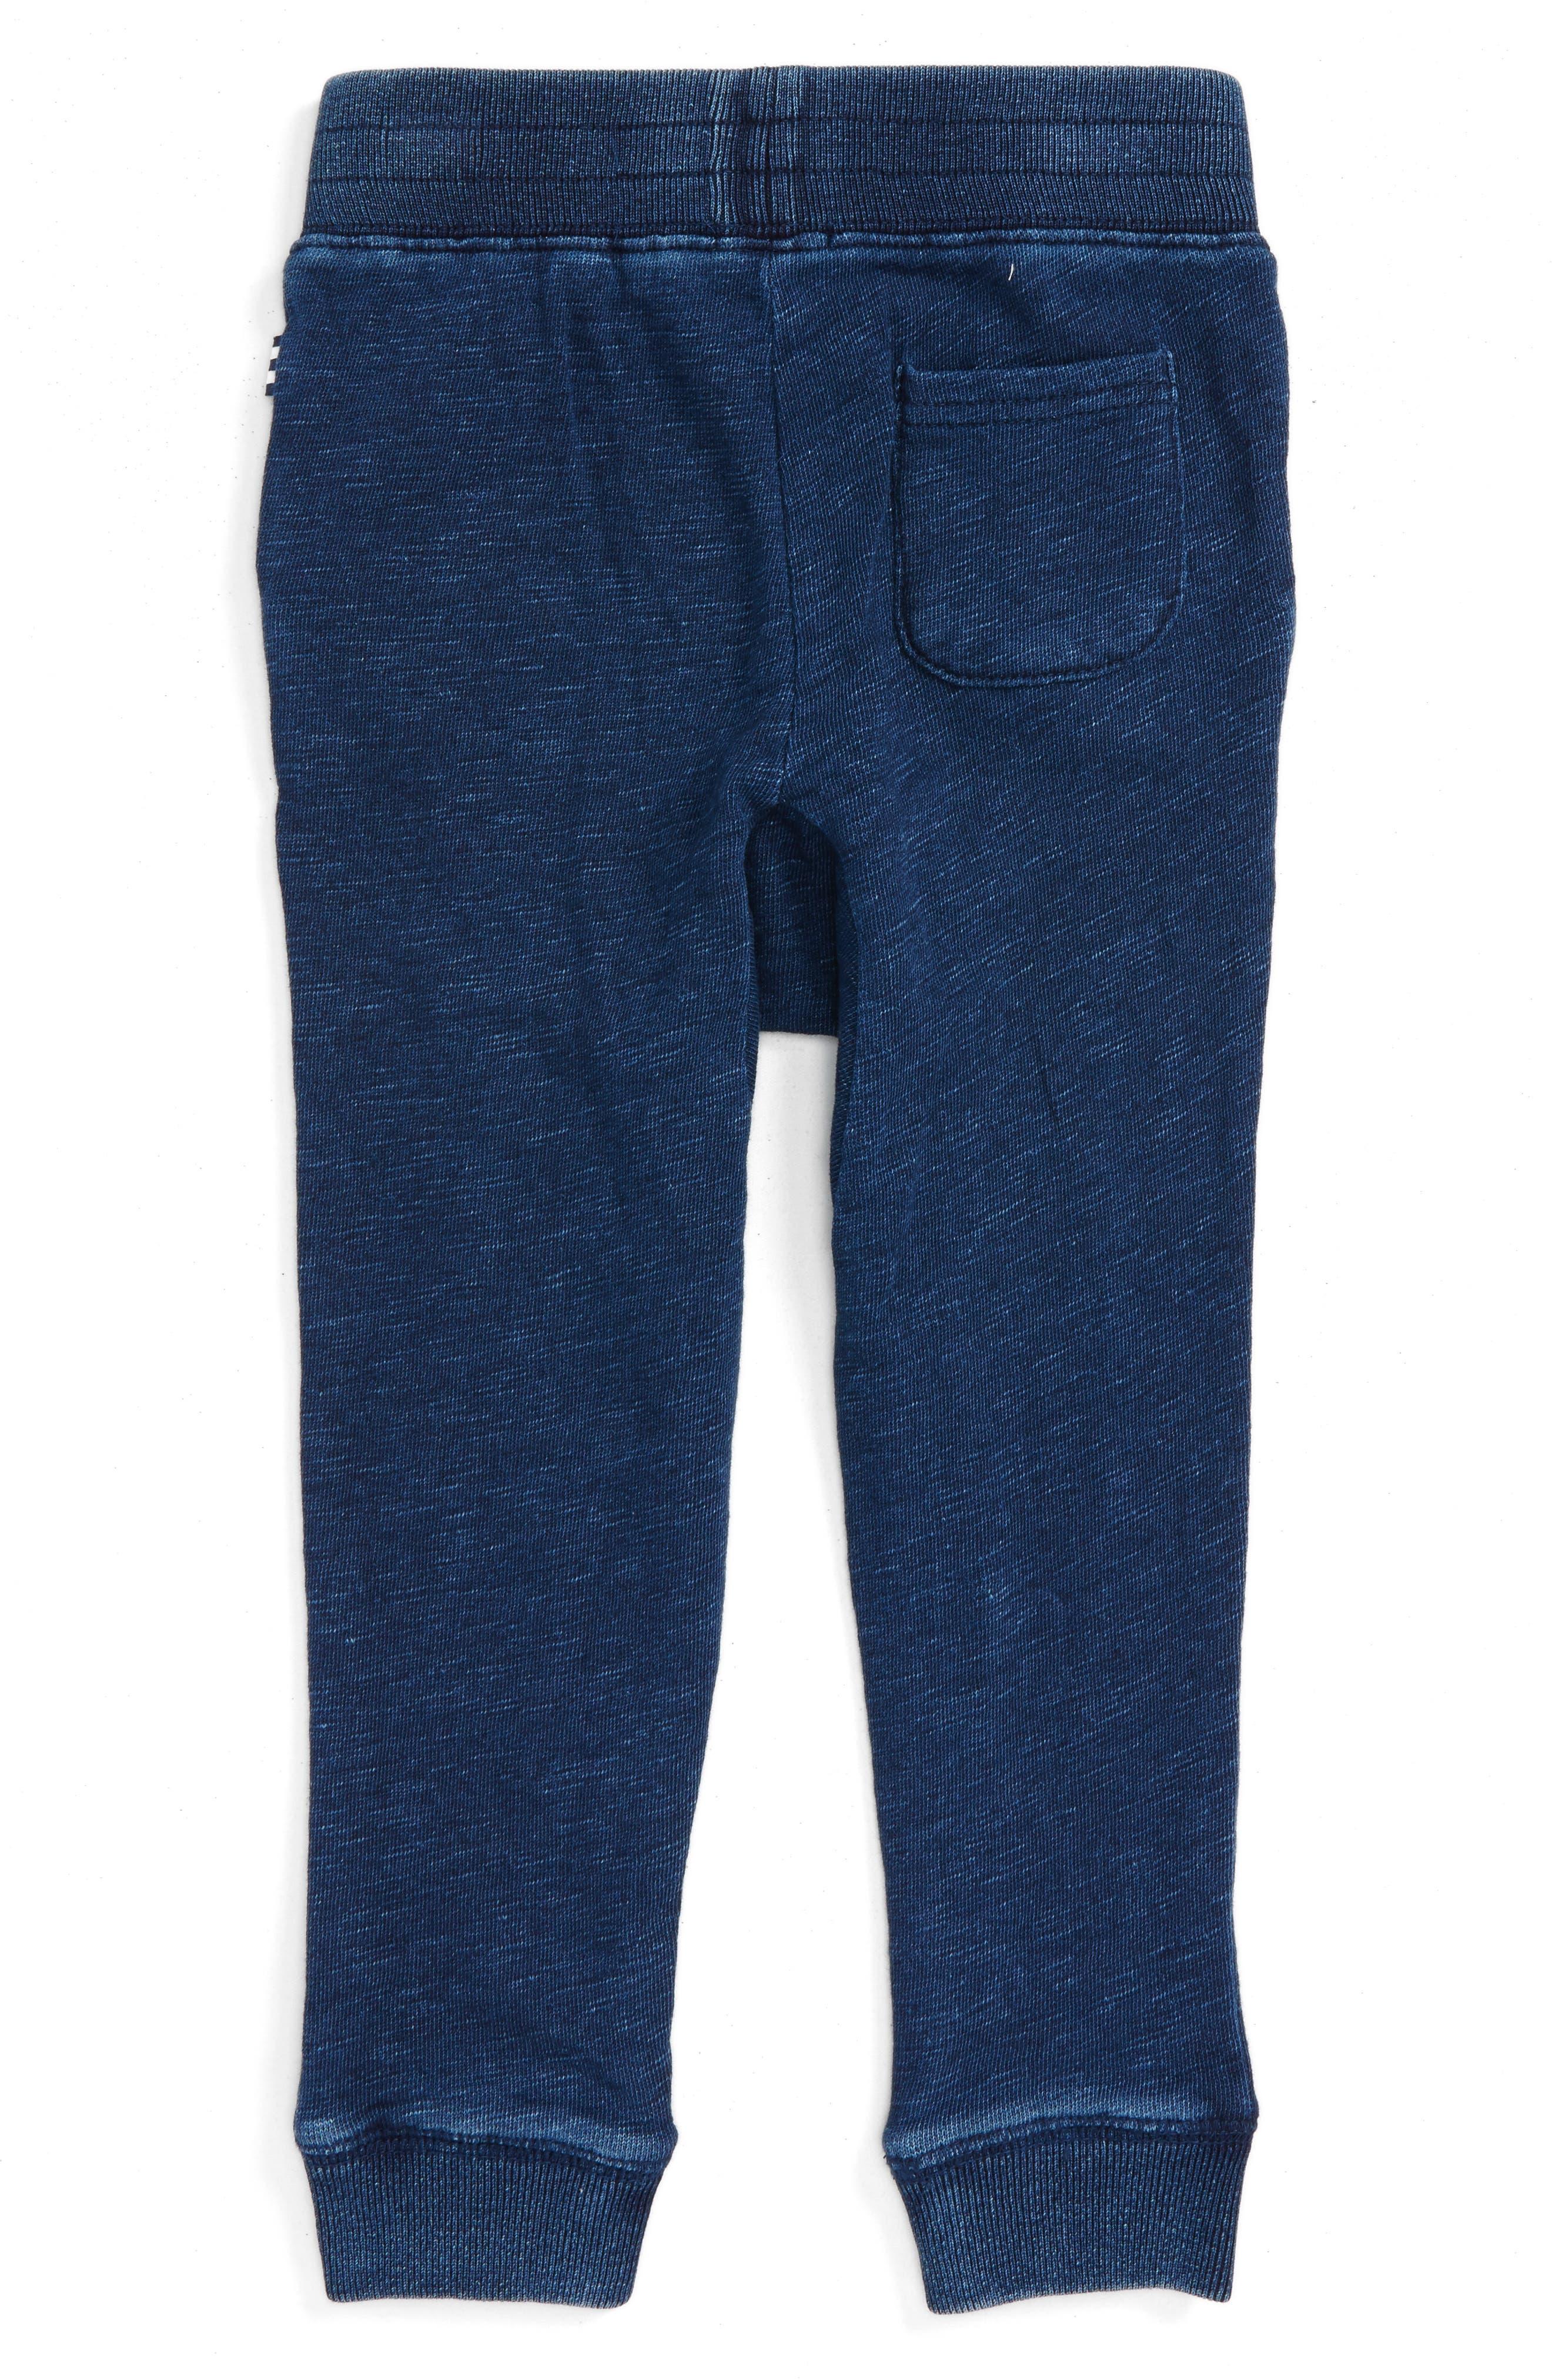 Double Knit Jogger Pants,                             Alternate thumbnail 2, color,                             400